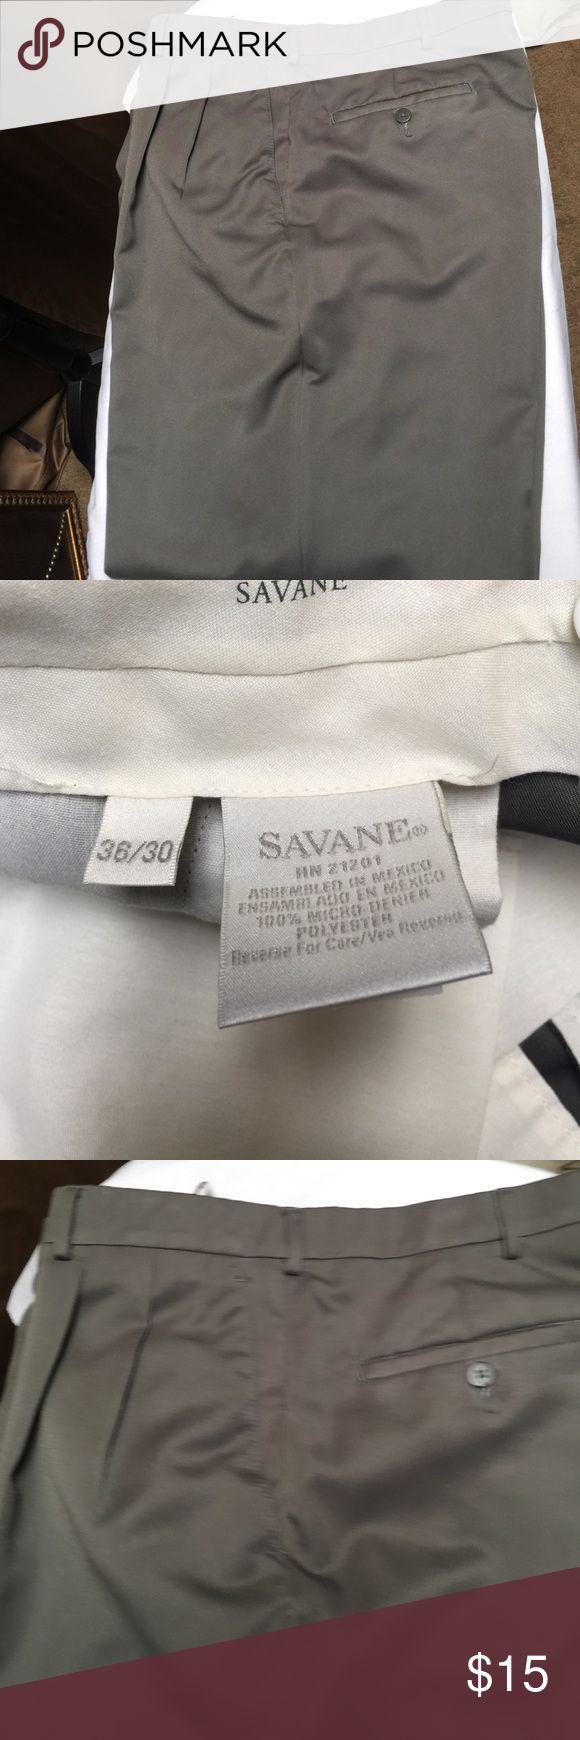 Savane men's pants. Savane Olive men's cuffed pants. Savane Pants Dress